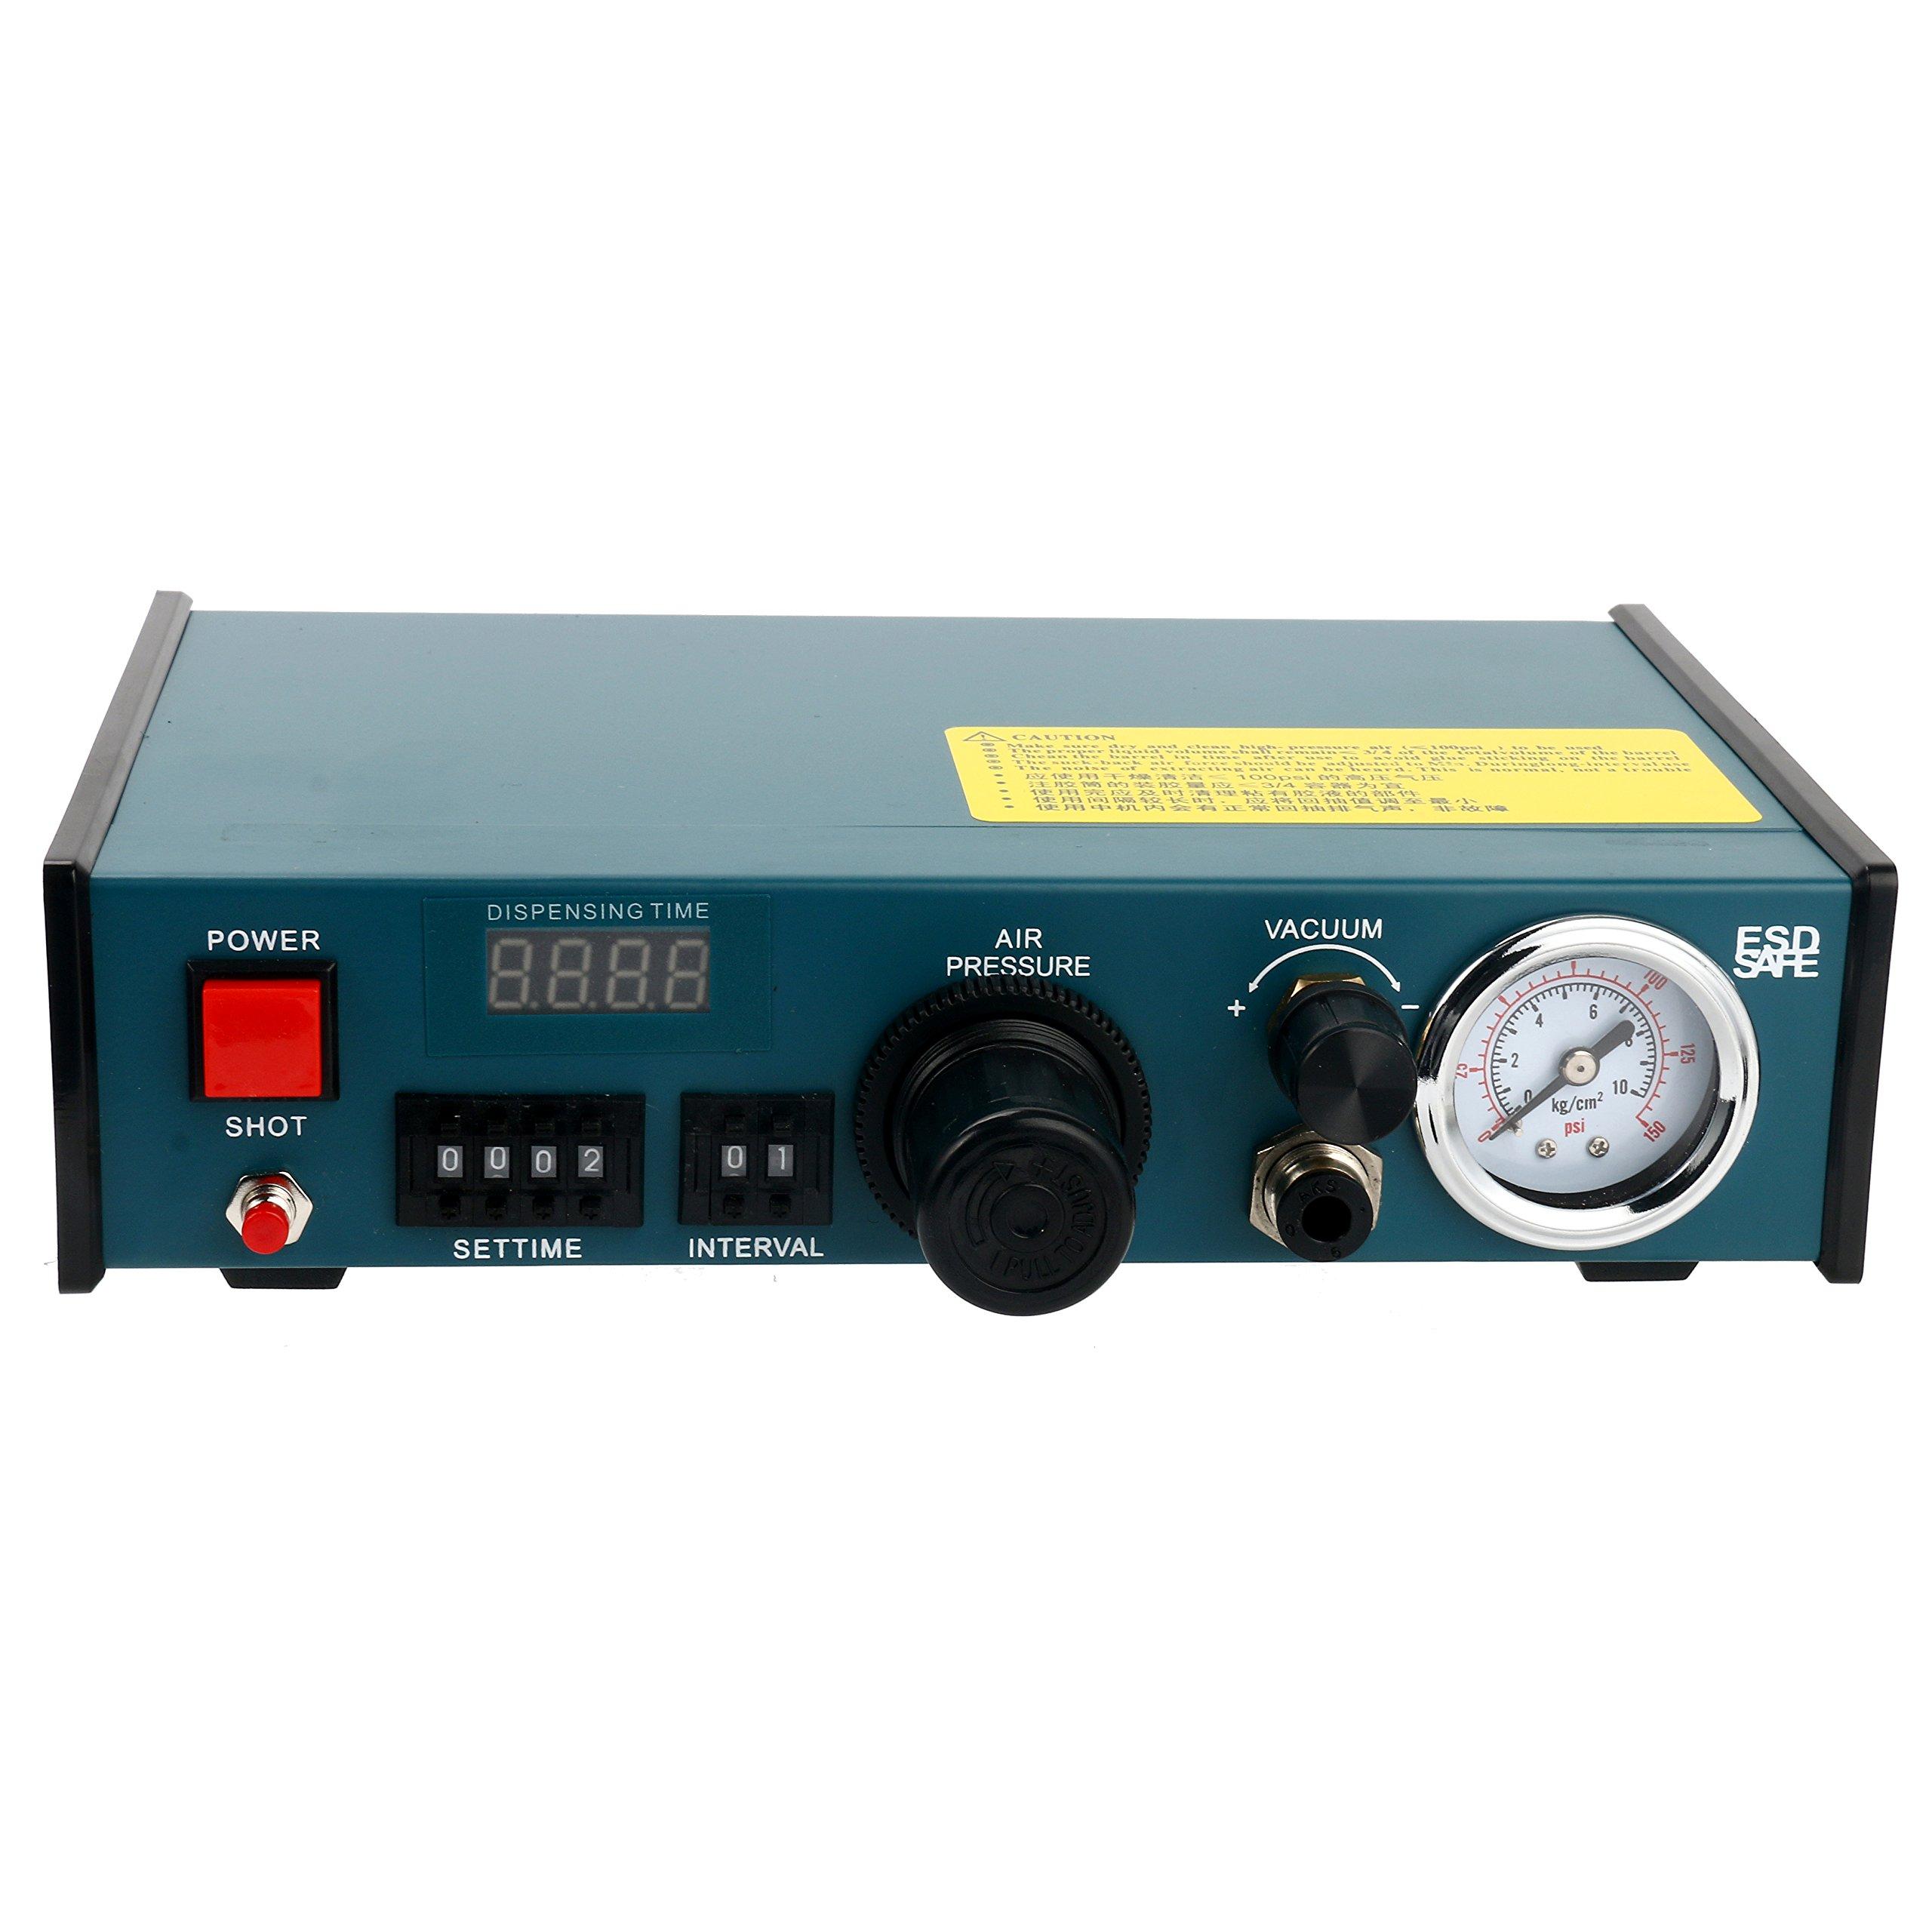 Digital Display Auto Glue Dispenser Solder Paste Liquid Controller Dropper 983A by YaeCCC (Image #6)